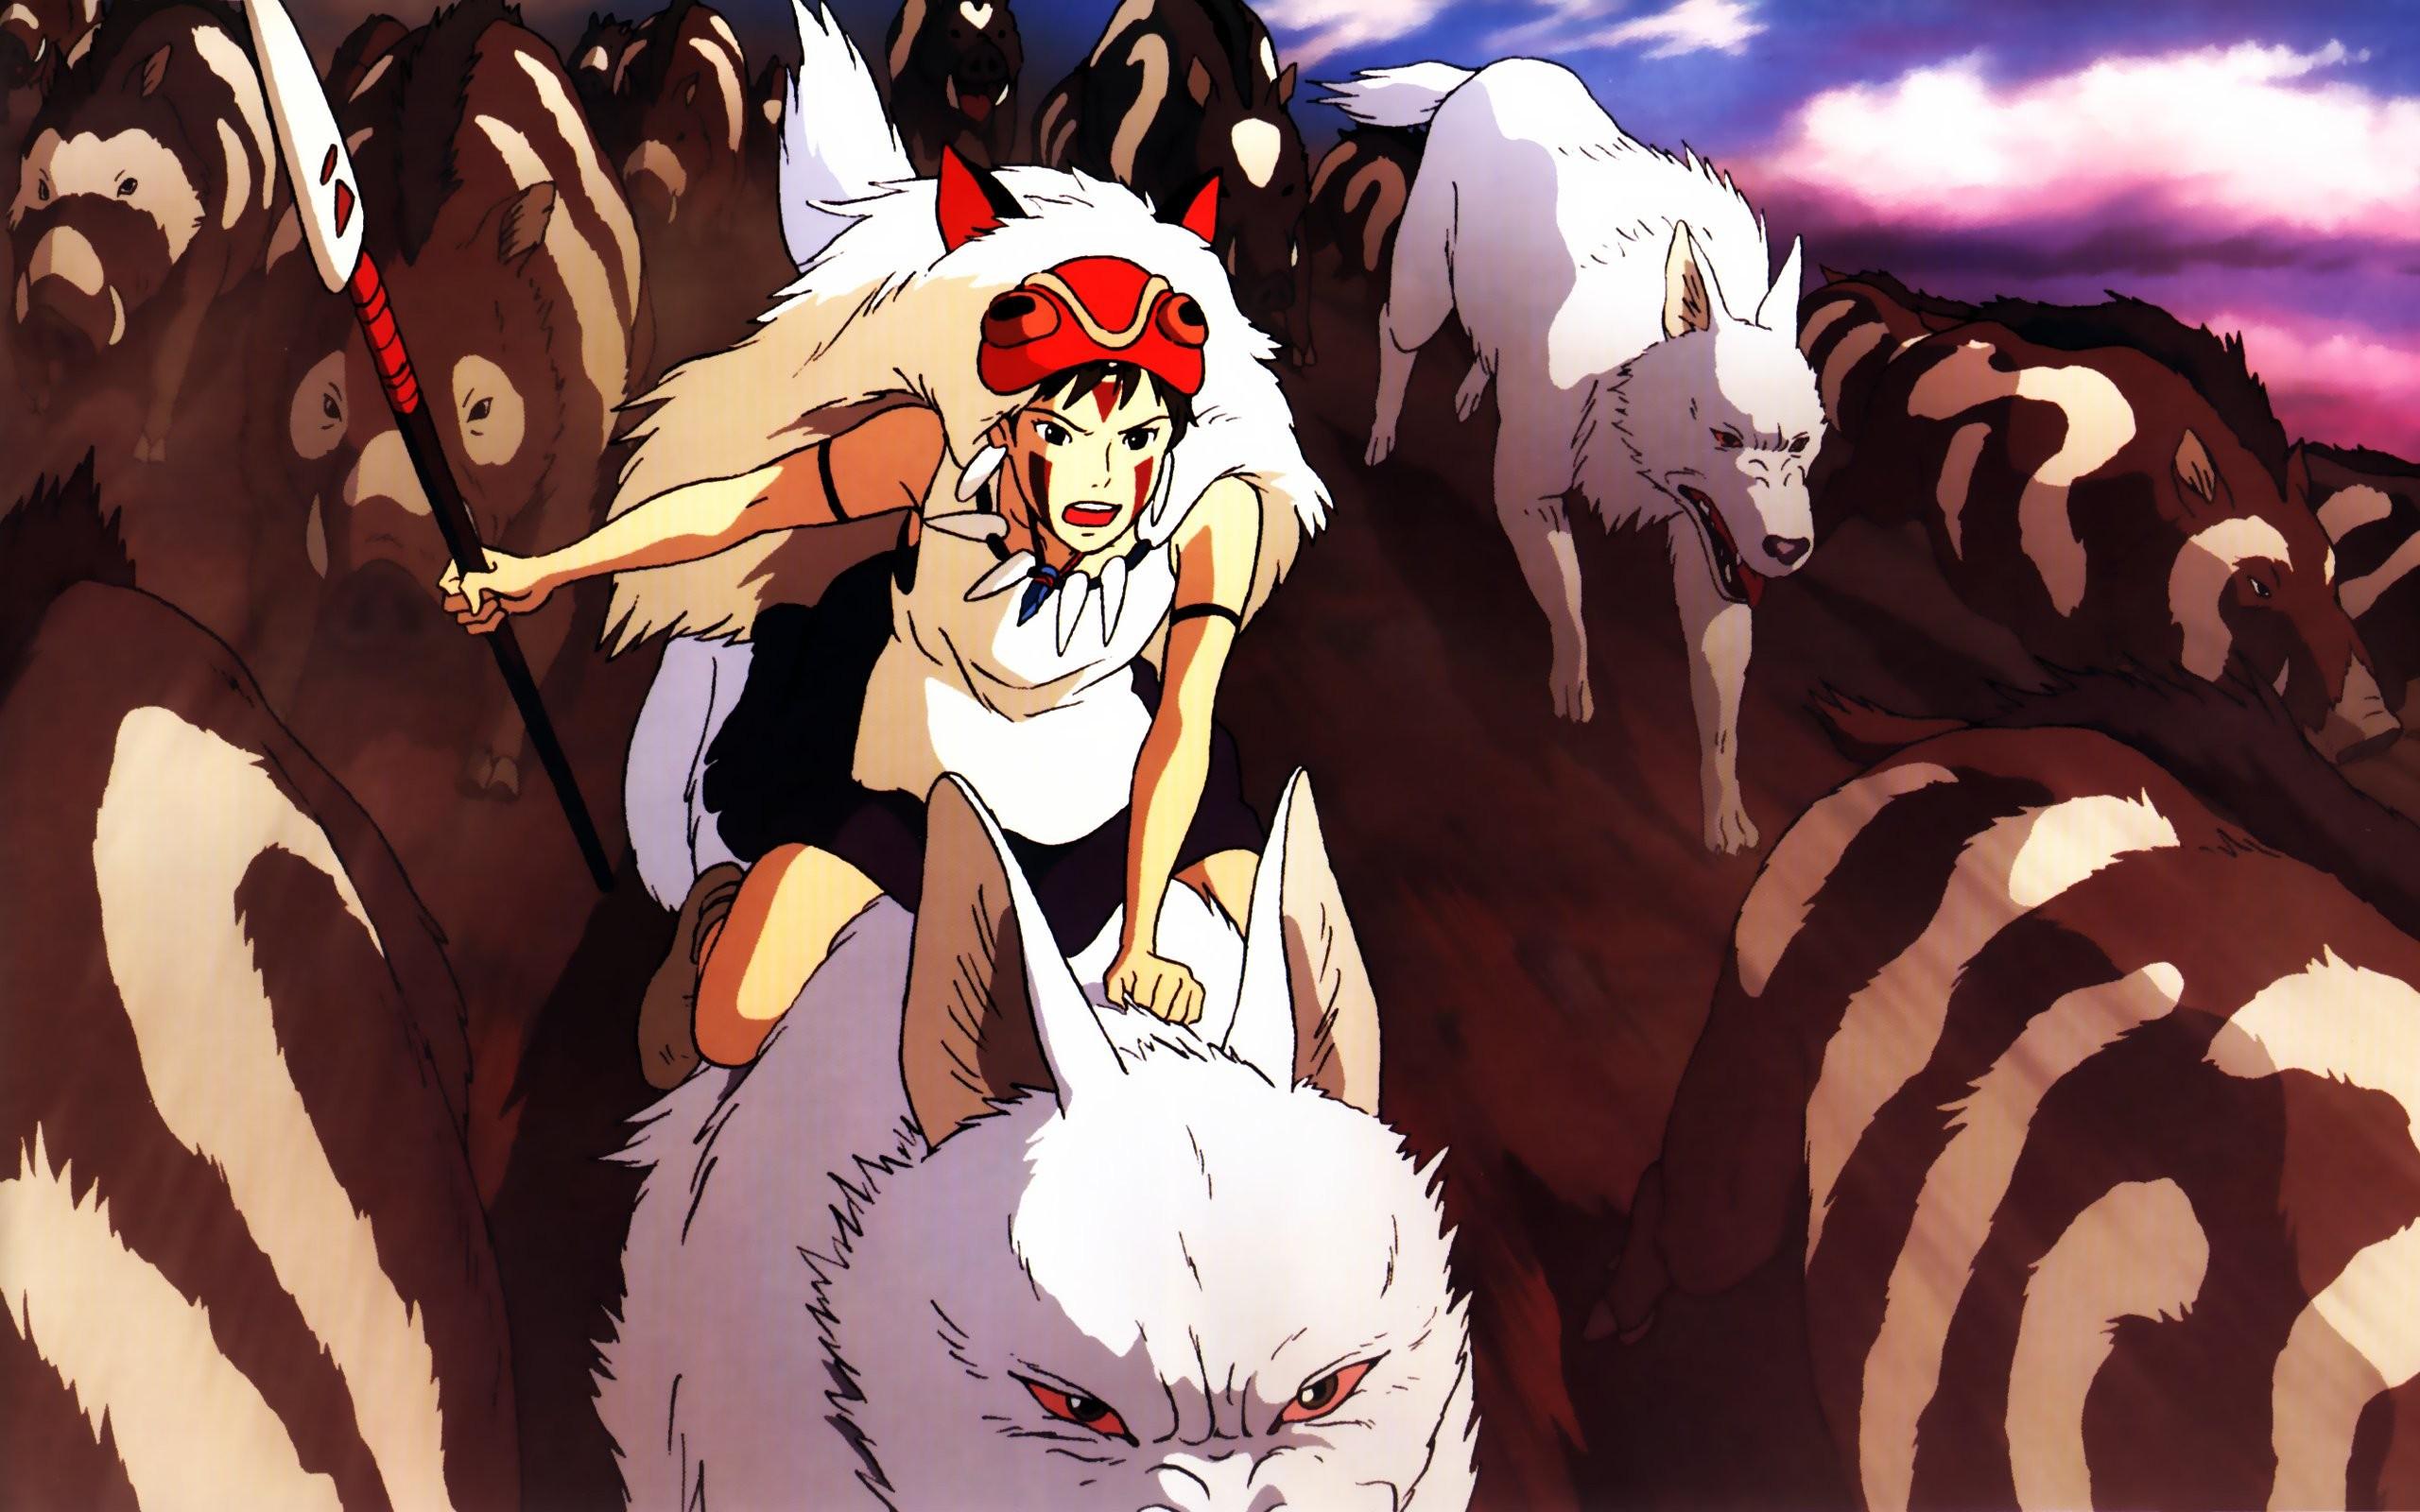 Anime 2560x1600 Studio Ghibli Princess Mononoke anime anime girls fantasy girl fantasy art spear